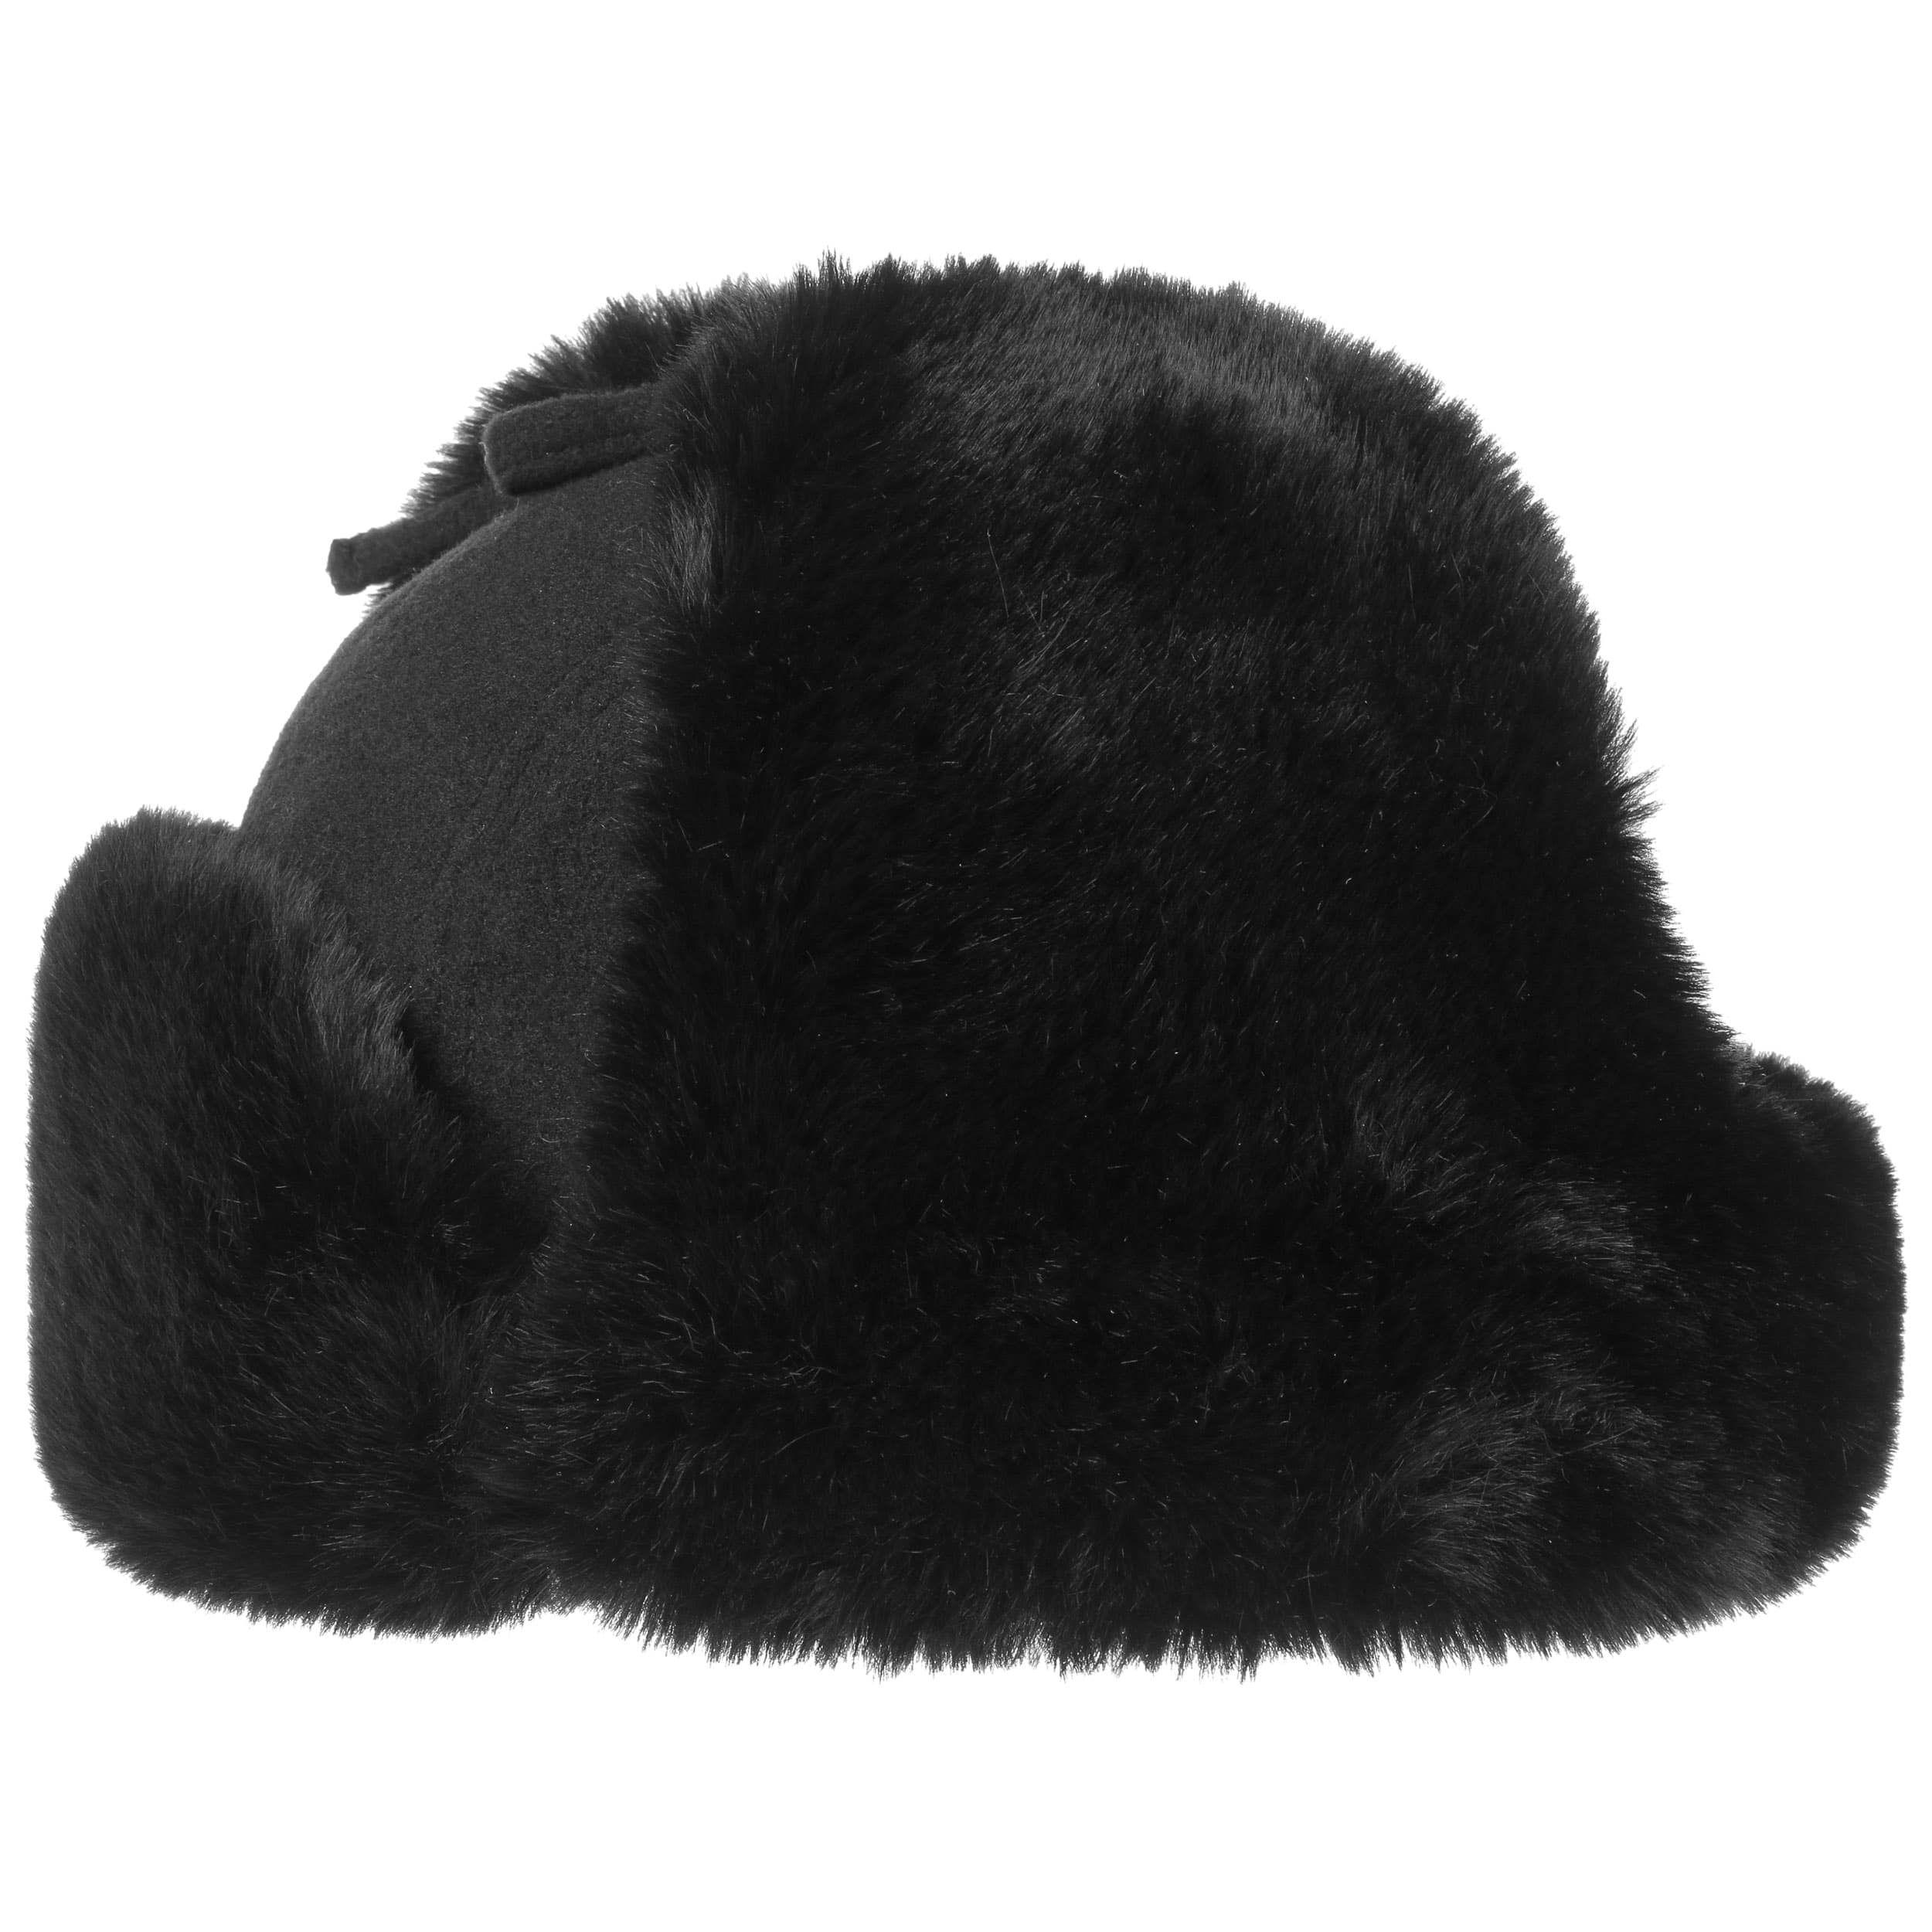 Barnaco Wool Fliegermütze schwarz